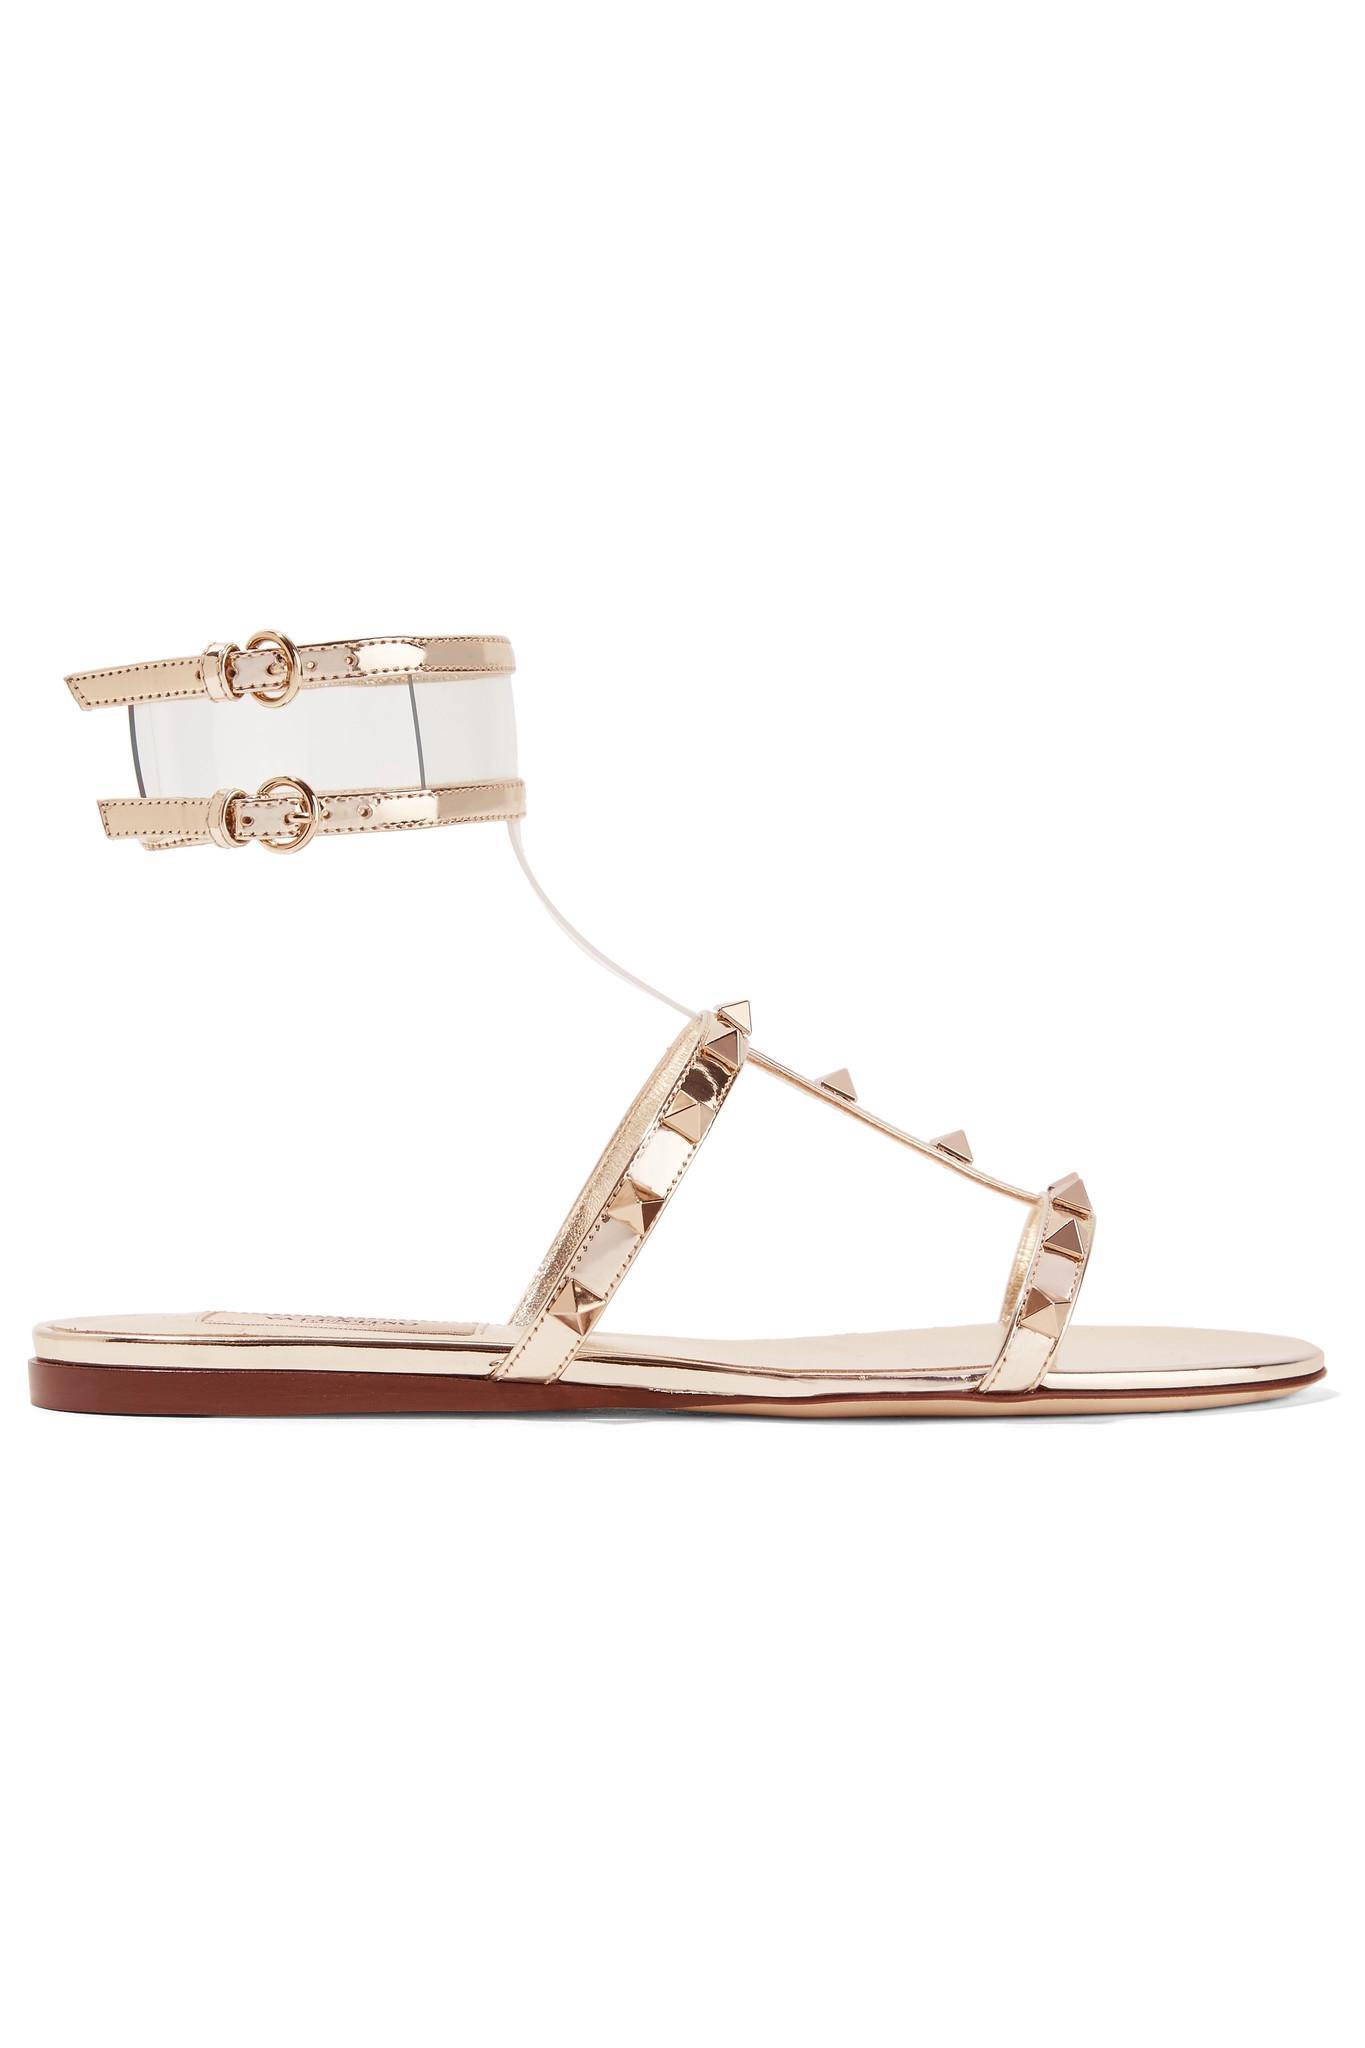 Valentino Garavani Moonwalk Rockstud sandals - Metallic Valentino I9inS626rv